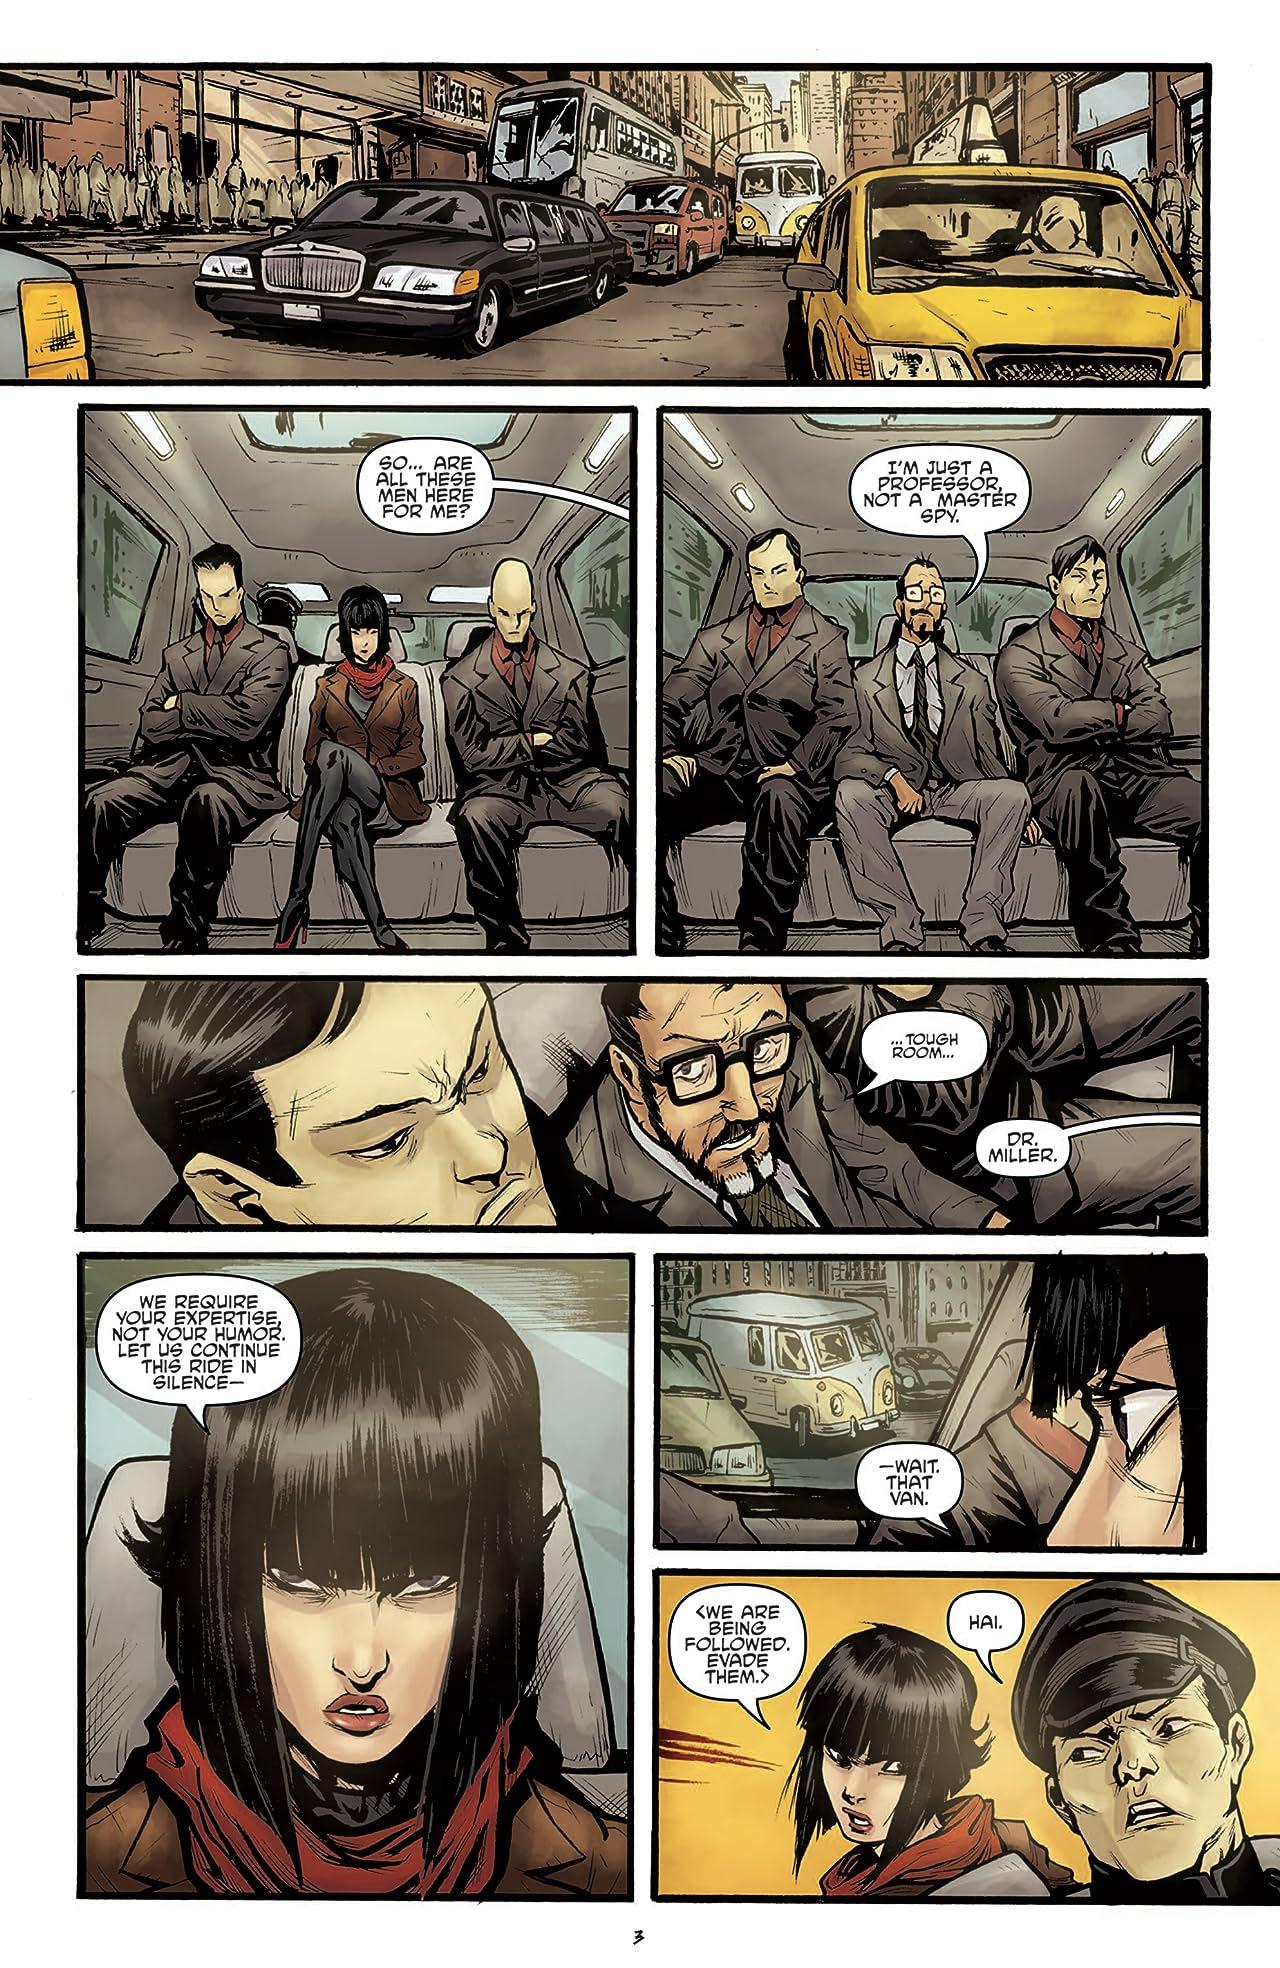 Teenage Mutant Ninja Turtles: Secret History of the Foot Clan #2 (of 4)